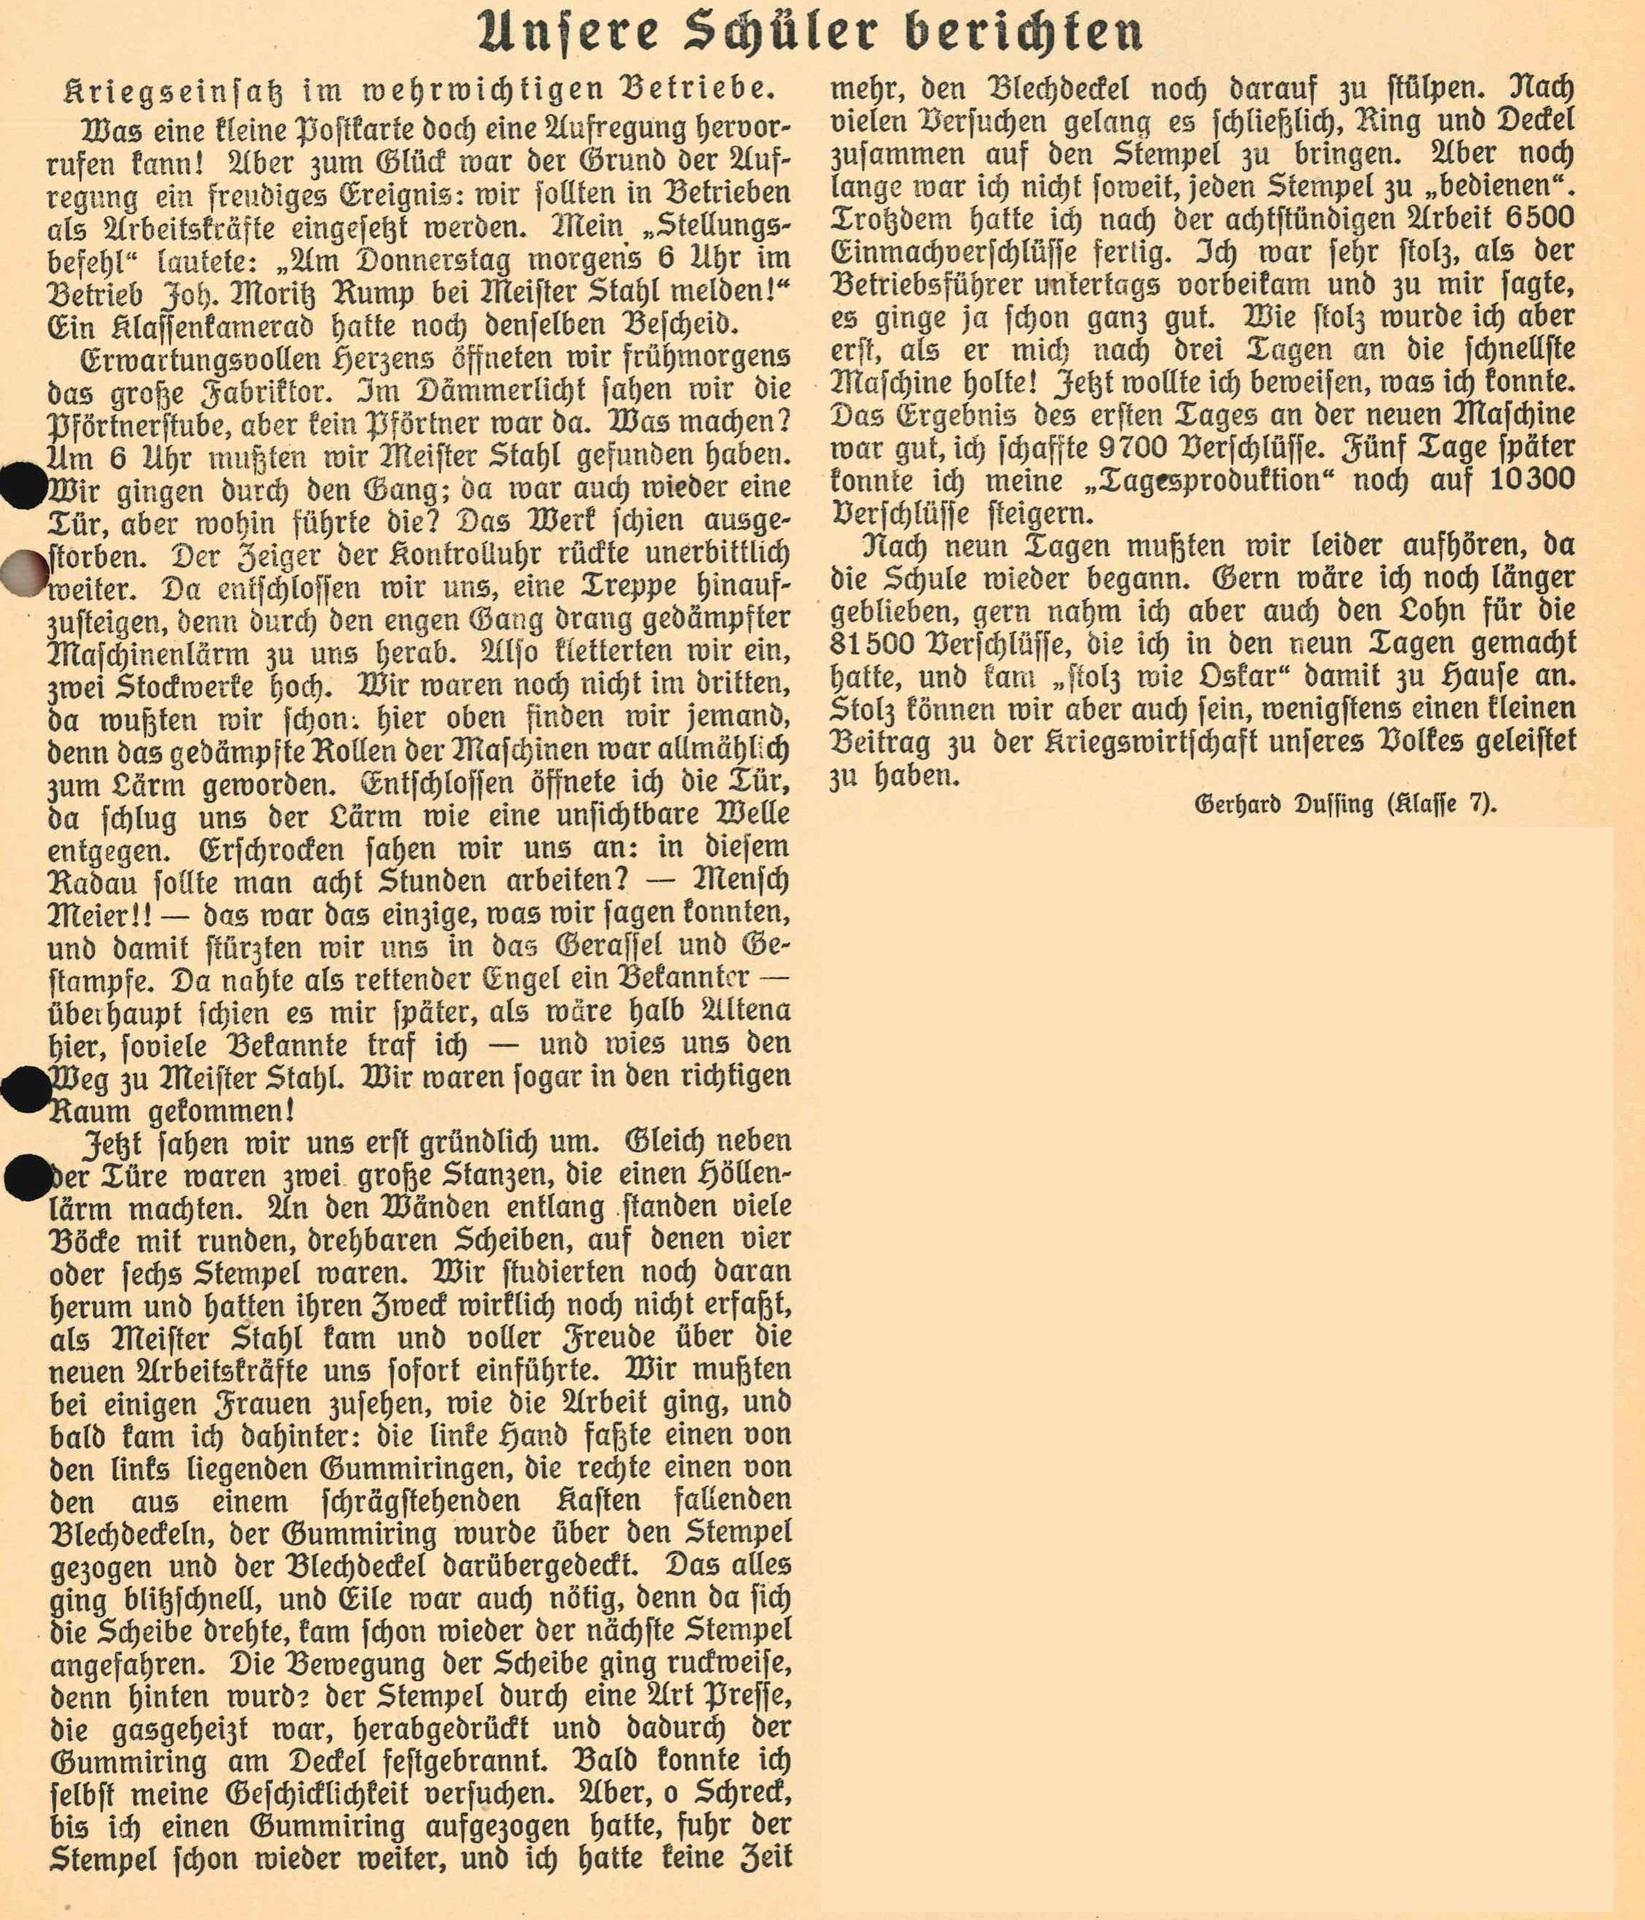 StA Al Blätter der Oberschule Dez 1940_7_detail.jpg